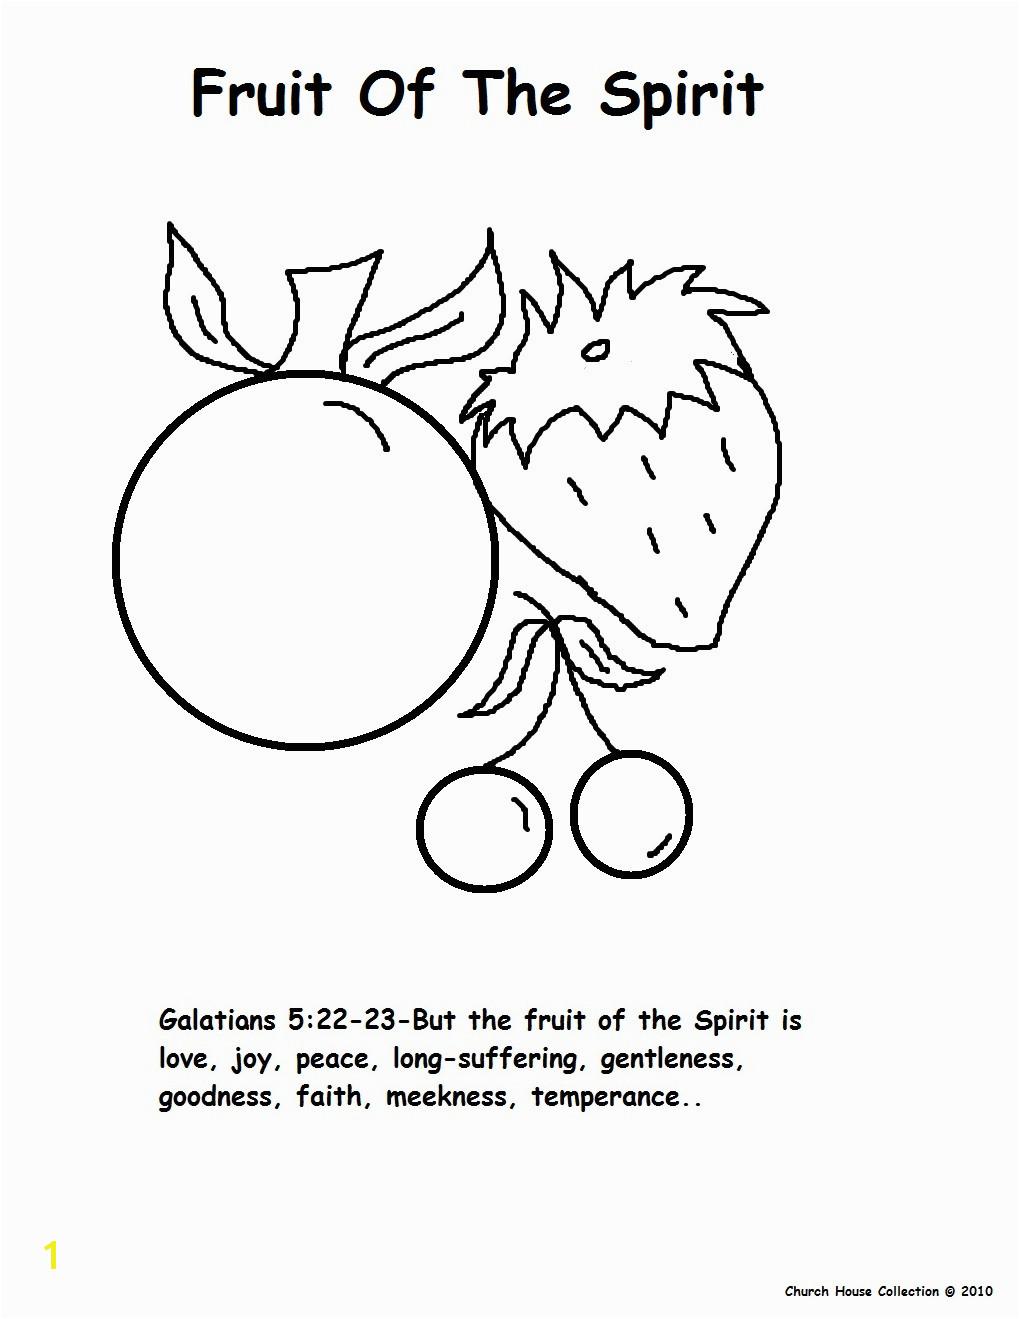 r=fruit of the spirit goodness